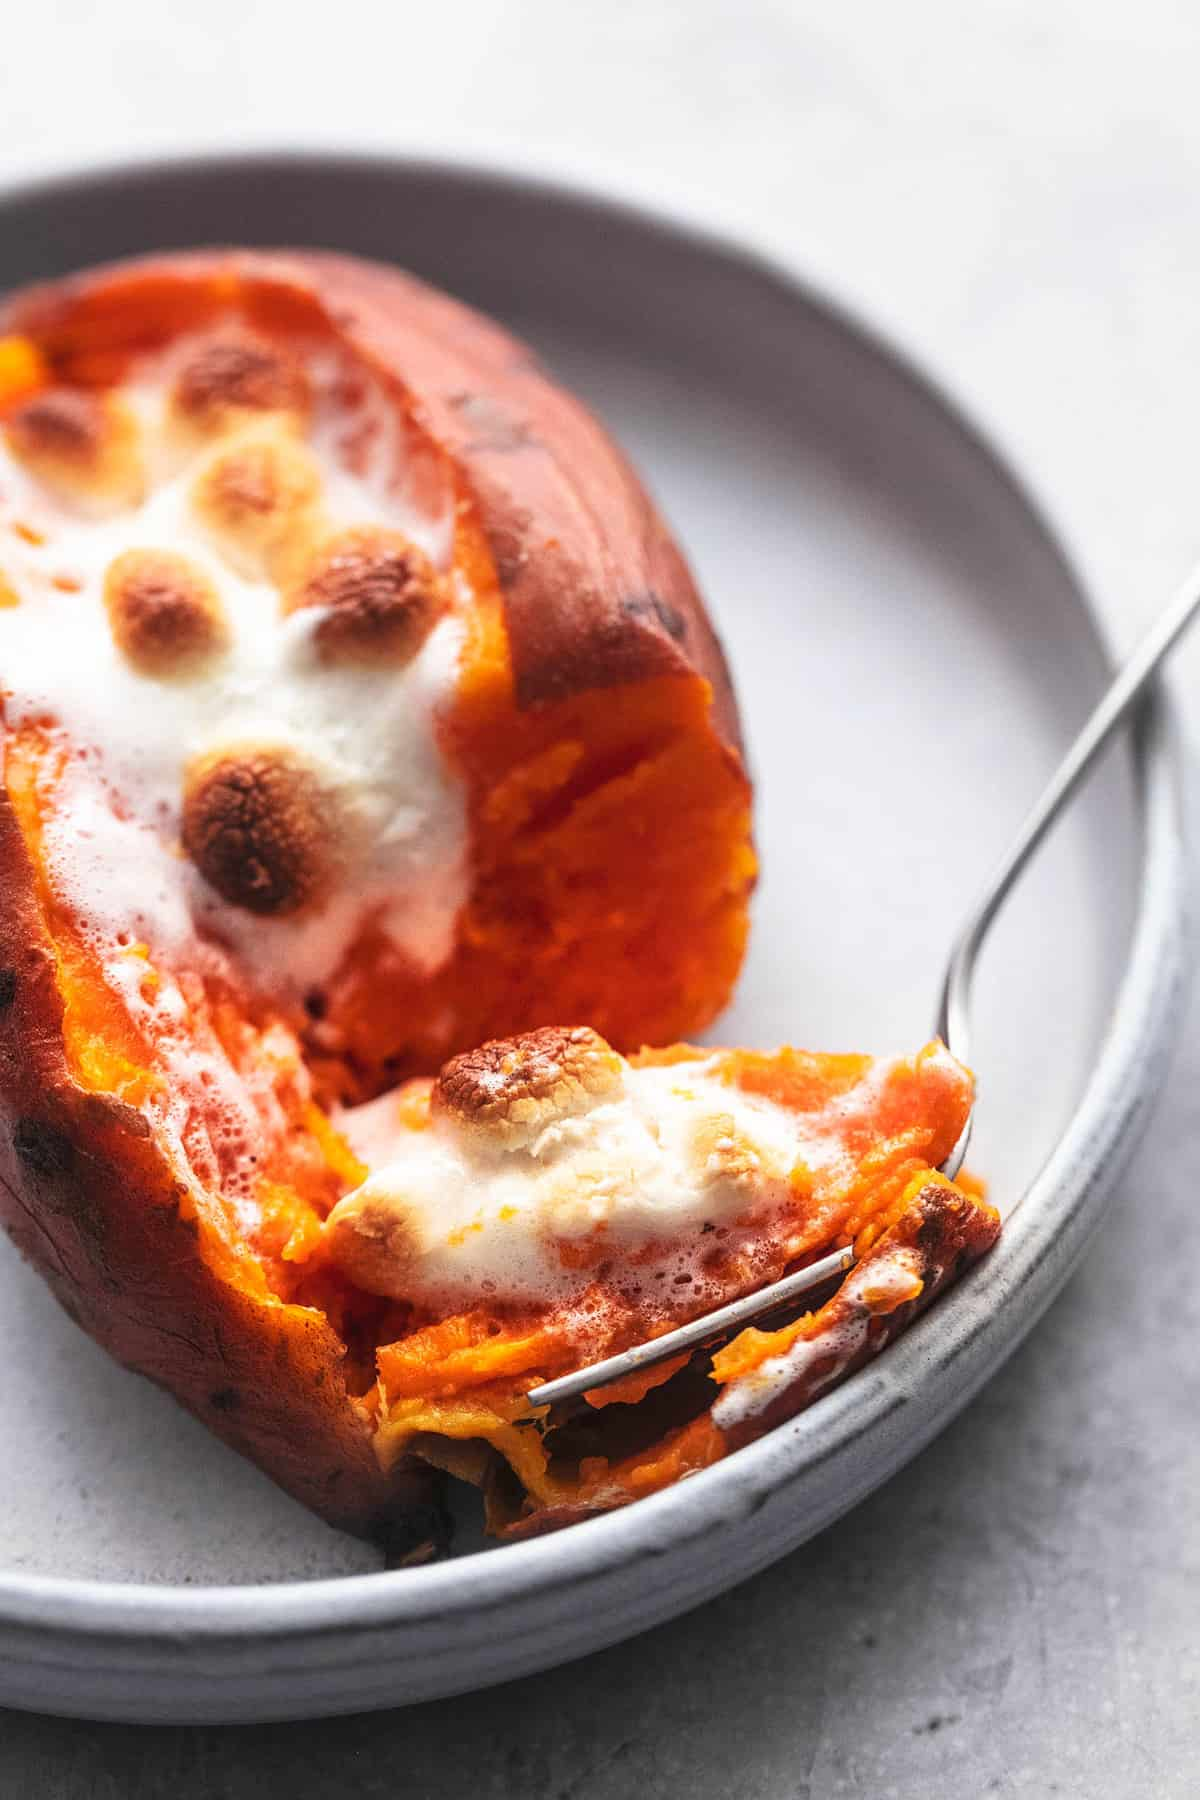 Instant Pot Baked Sweet Potatoes einfaches und leckeres Beilagenrezept | lecremedelacrumb.com